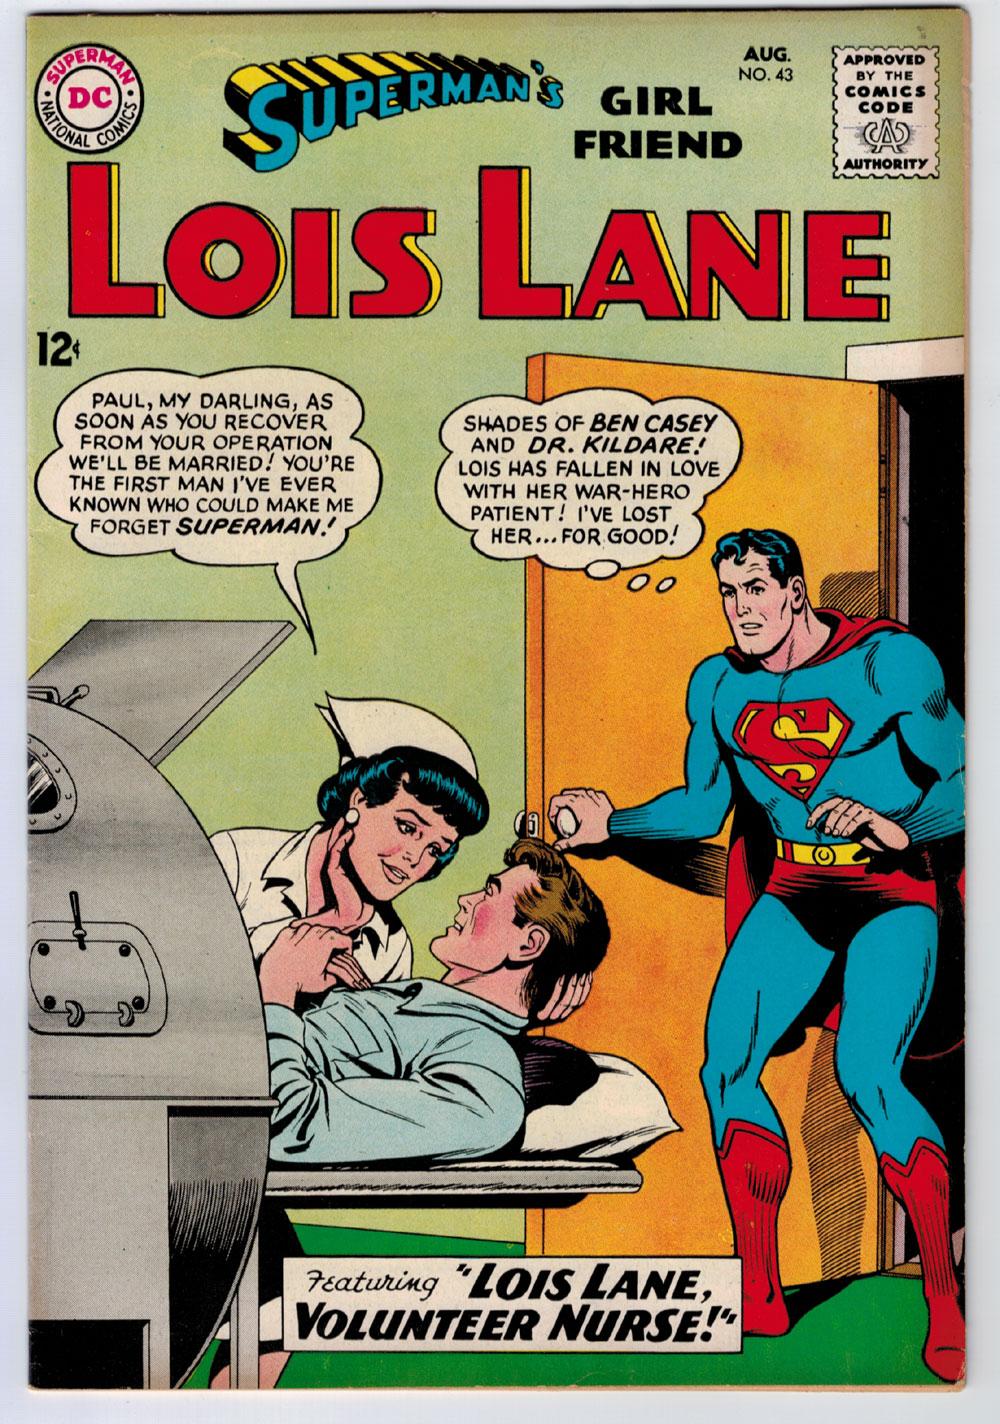 Supermans girlfriend lois lane 43 65 creamoff white pages silver supermans girlfriend lois lane 43 65 creamoff white pages silver age altavistaventures Choice Image